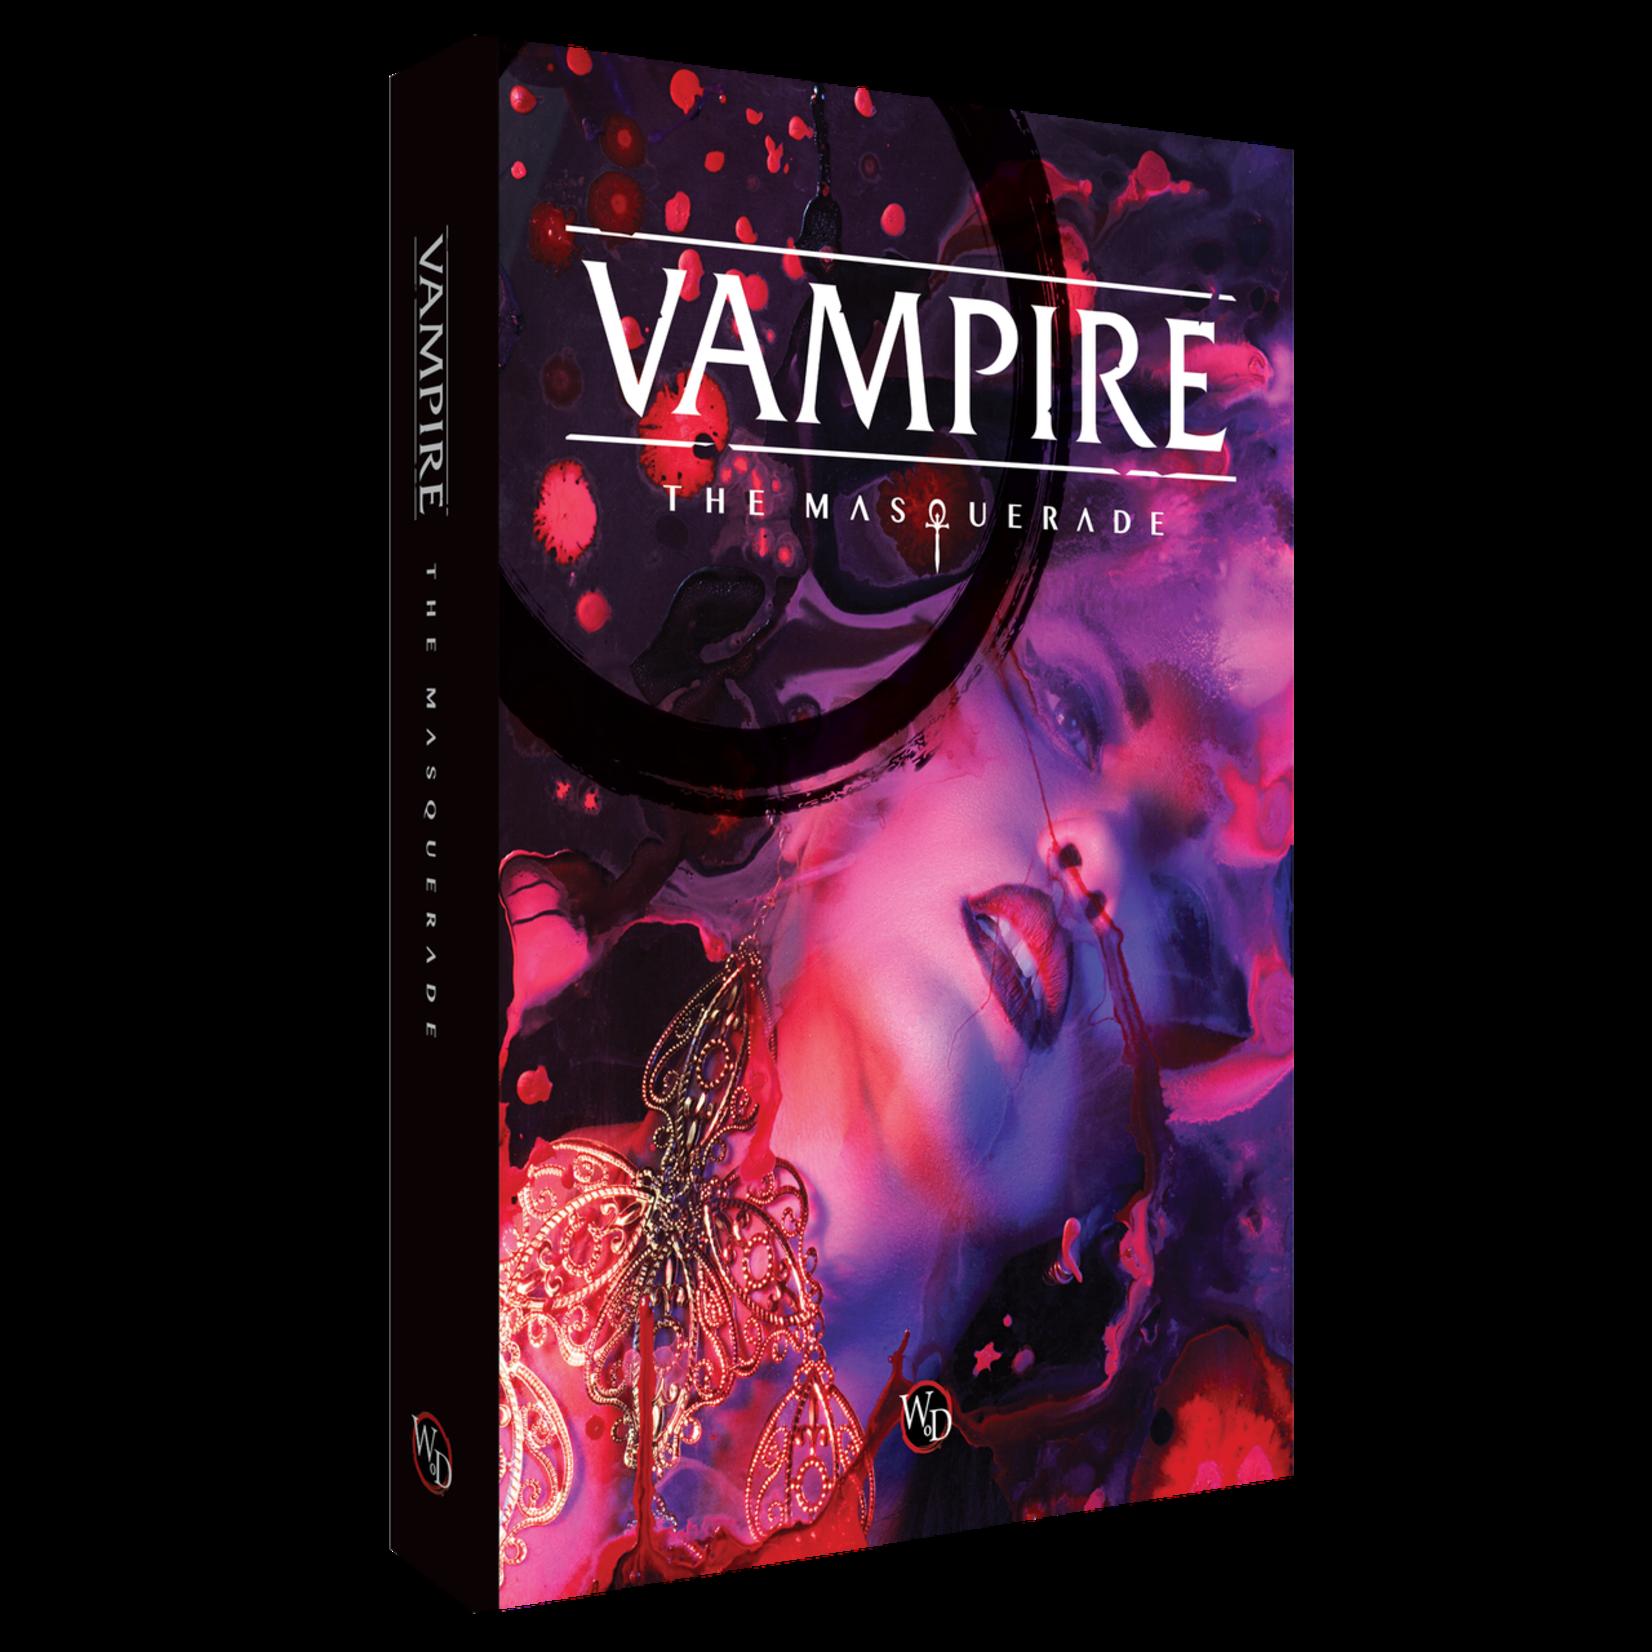 Renegade Vampire the Masquerade 5th Edition Core Rulebook HC